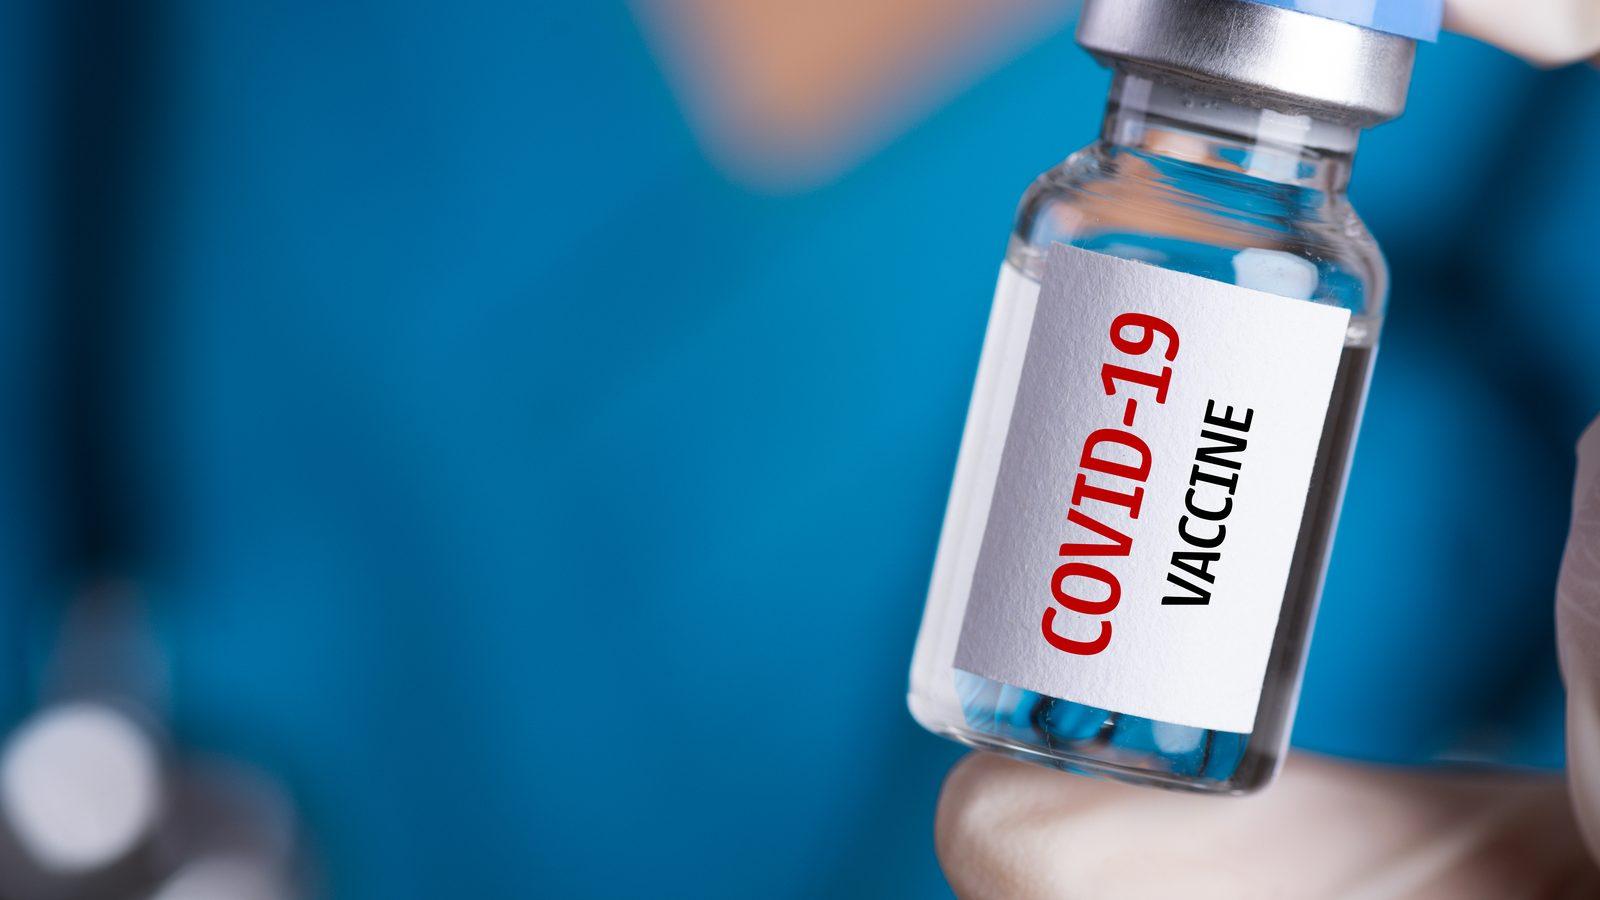 Organizations adopt vaccination policies